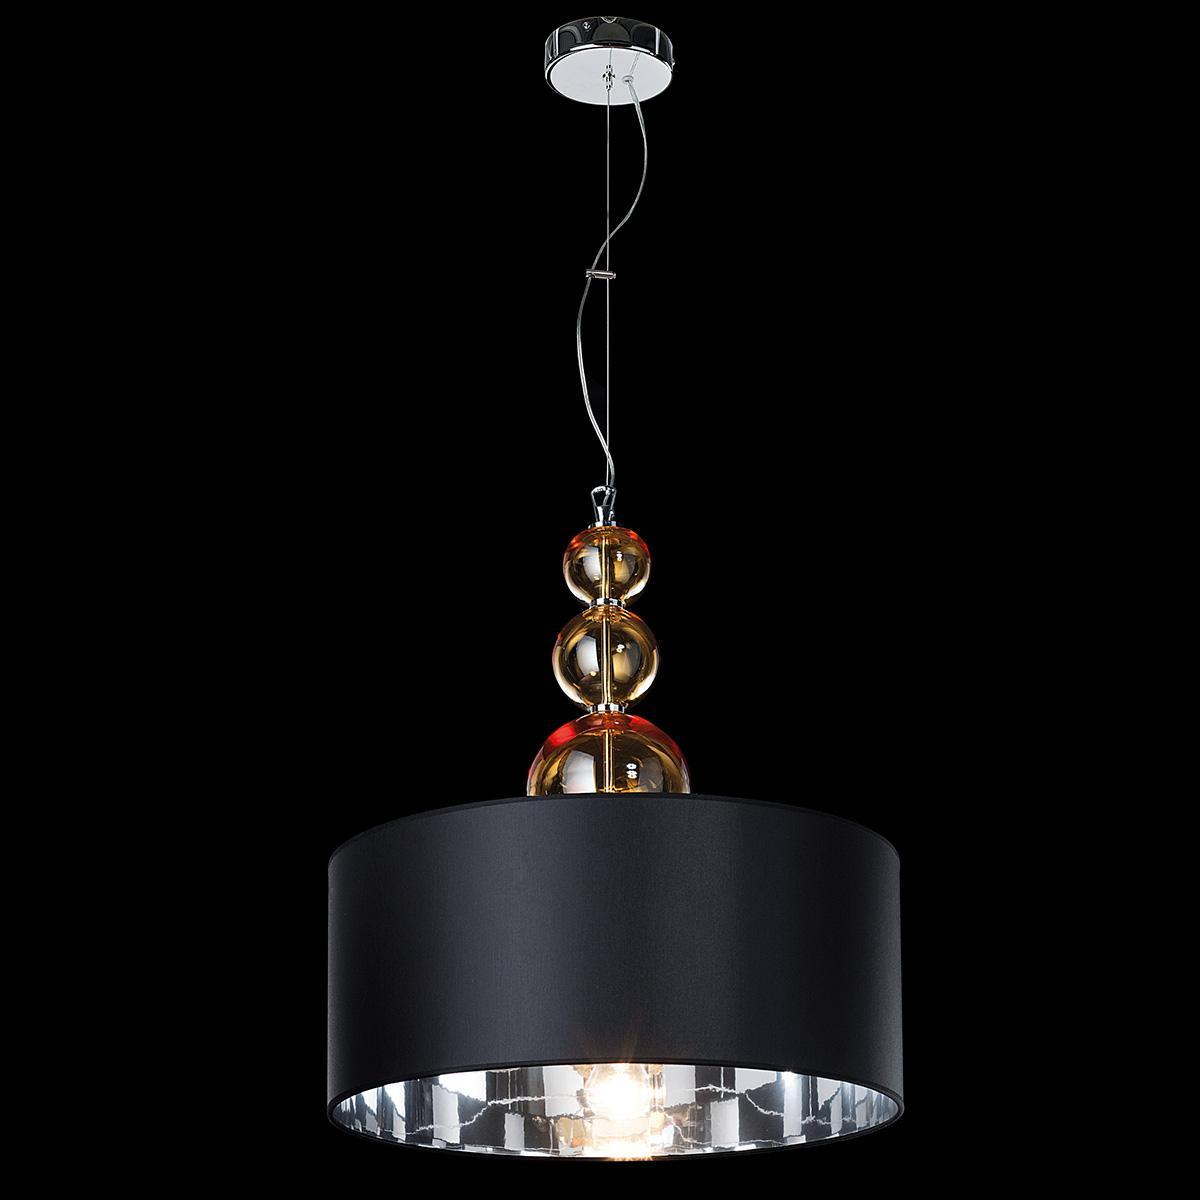 """Santina"" suspension en verre de Murano - 1 lumière - ambre"